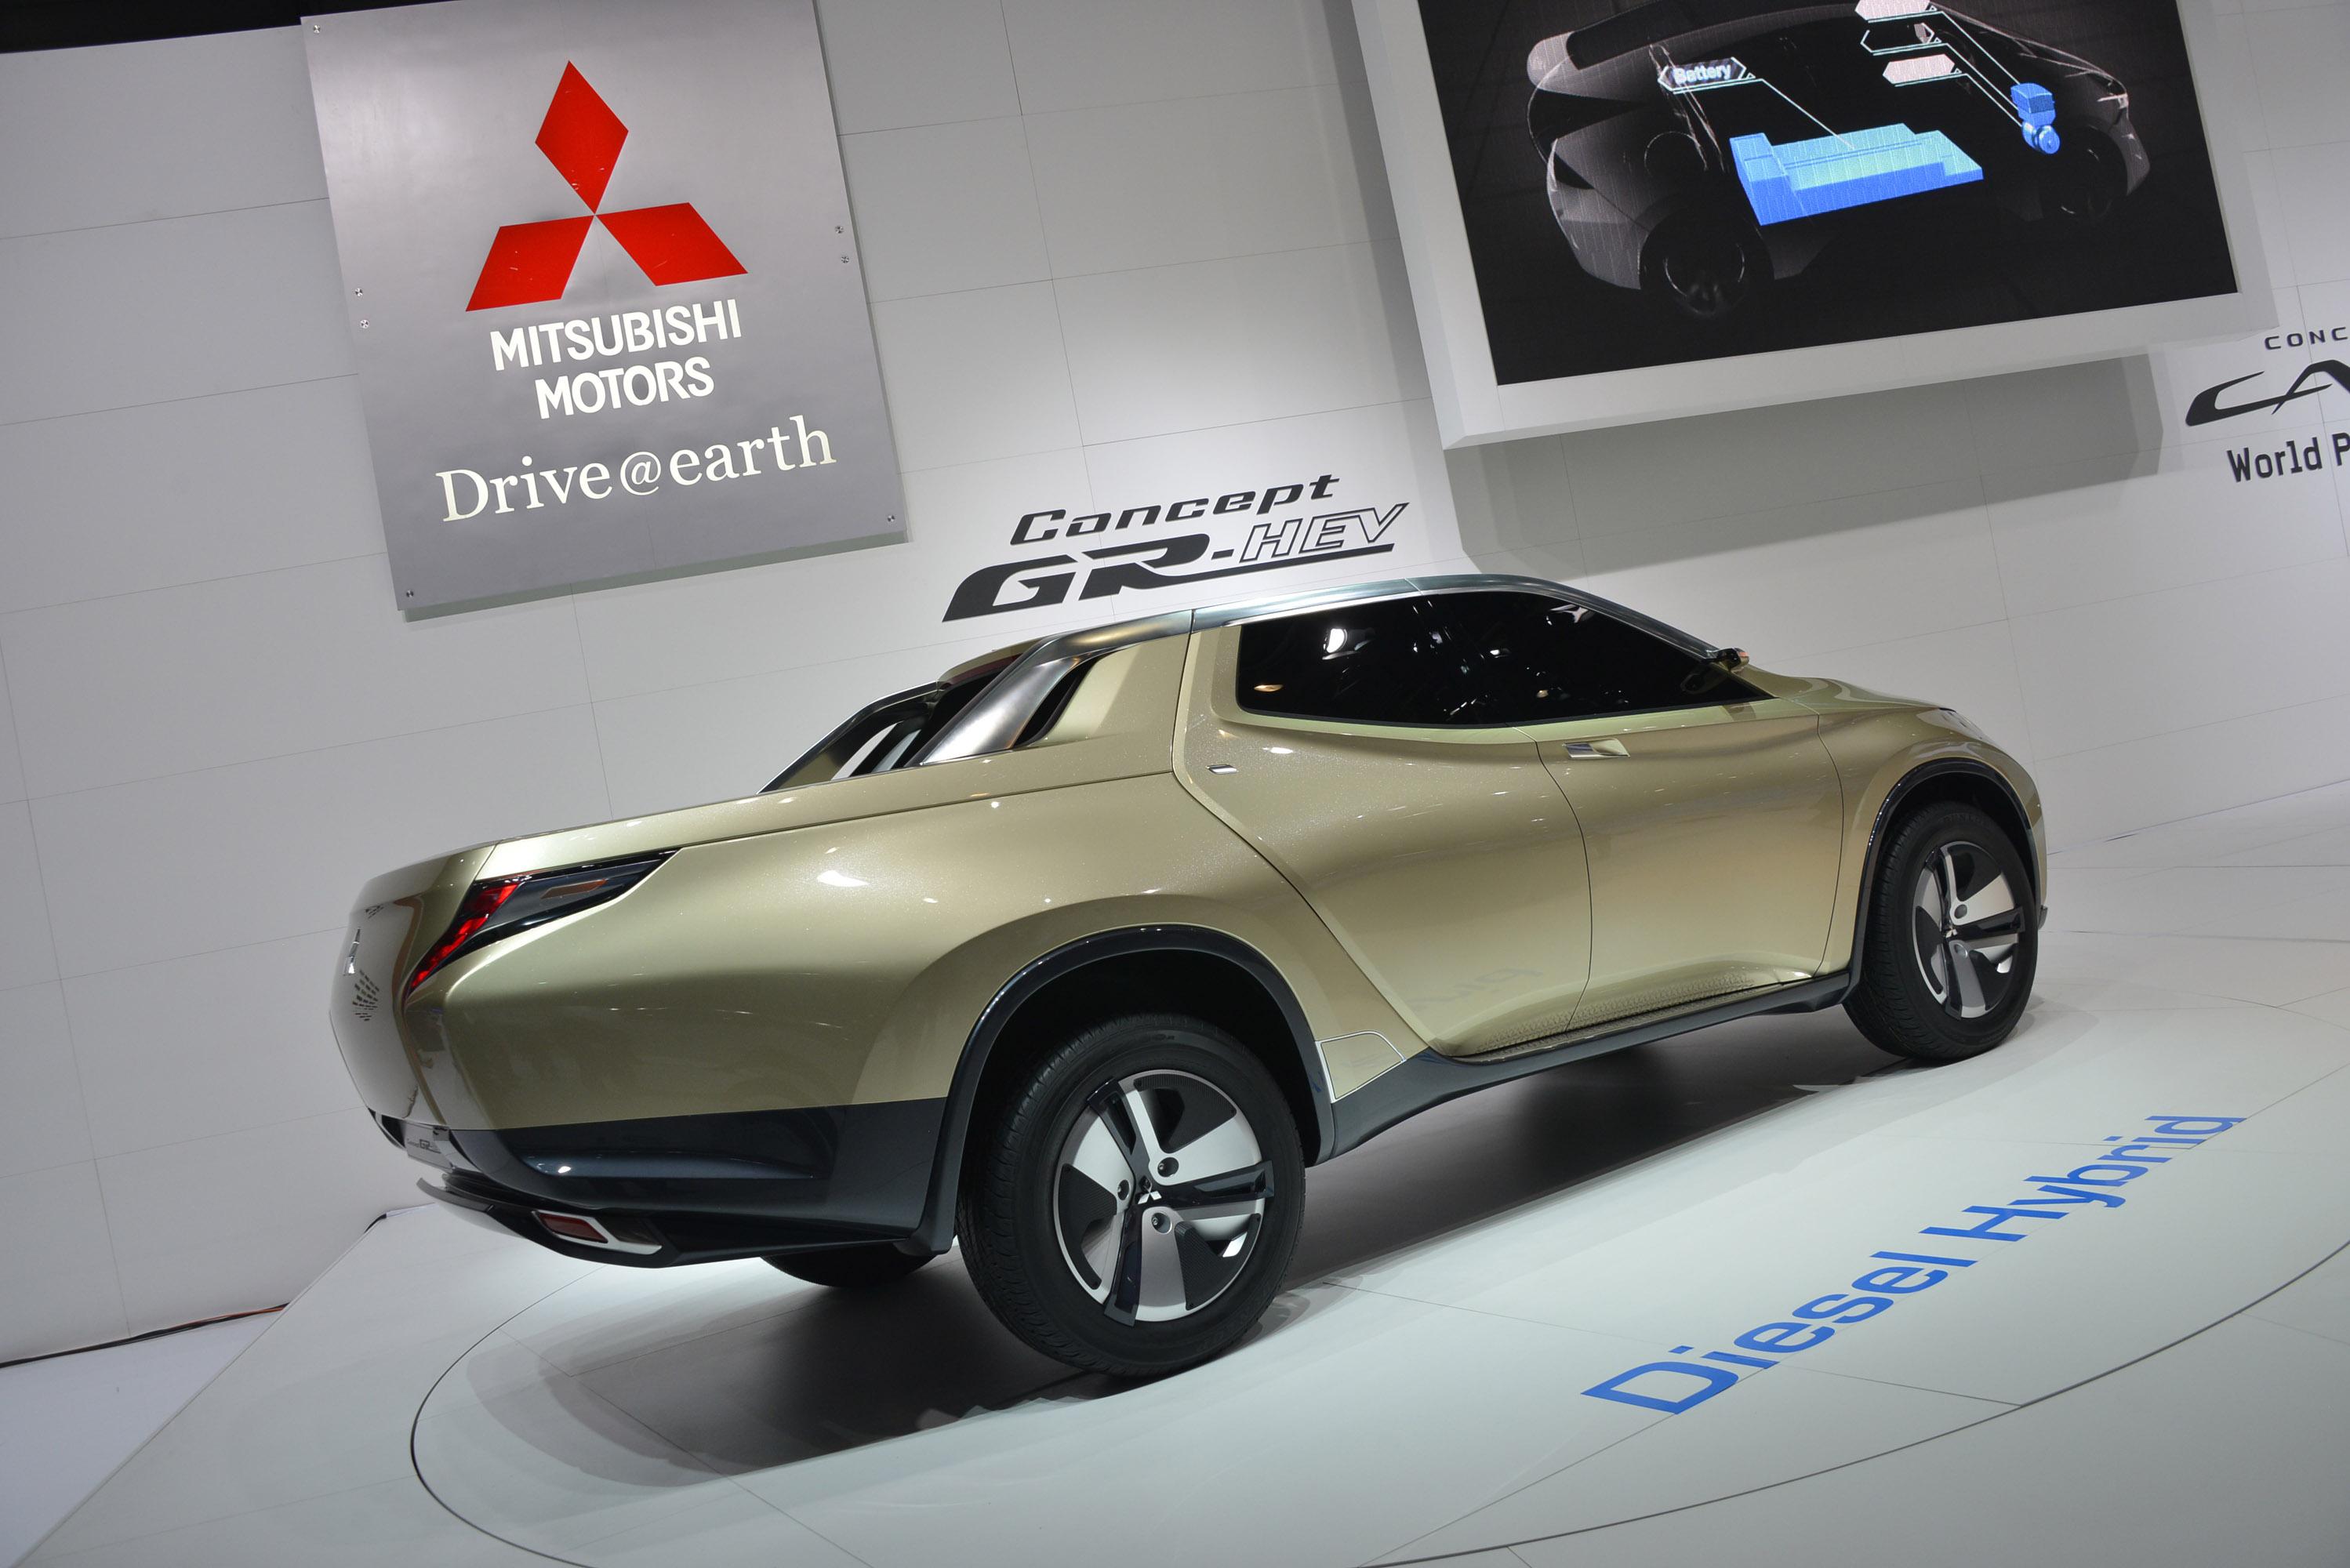 Lincoln MKZ Concept Detroit 2012 - Picture 63360